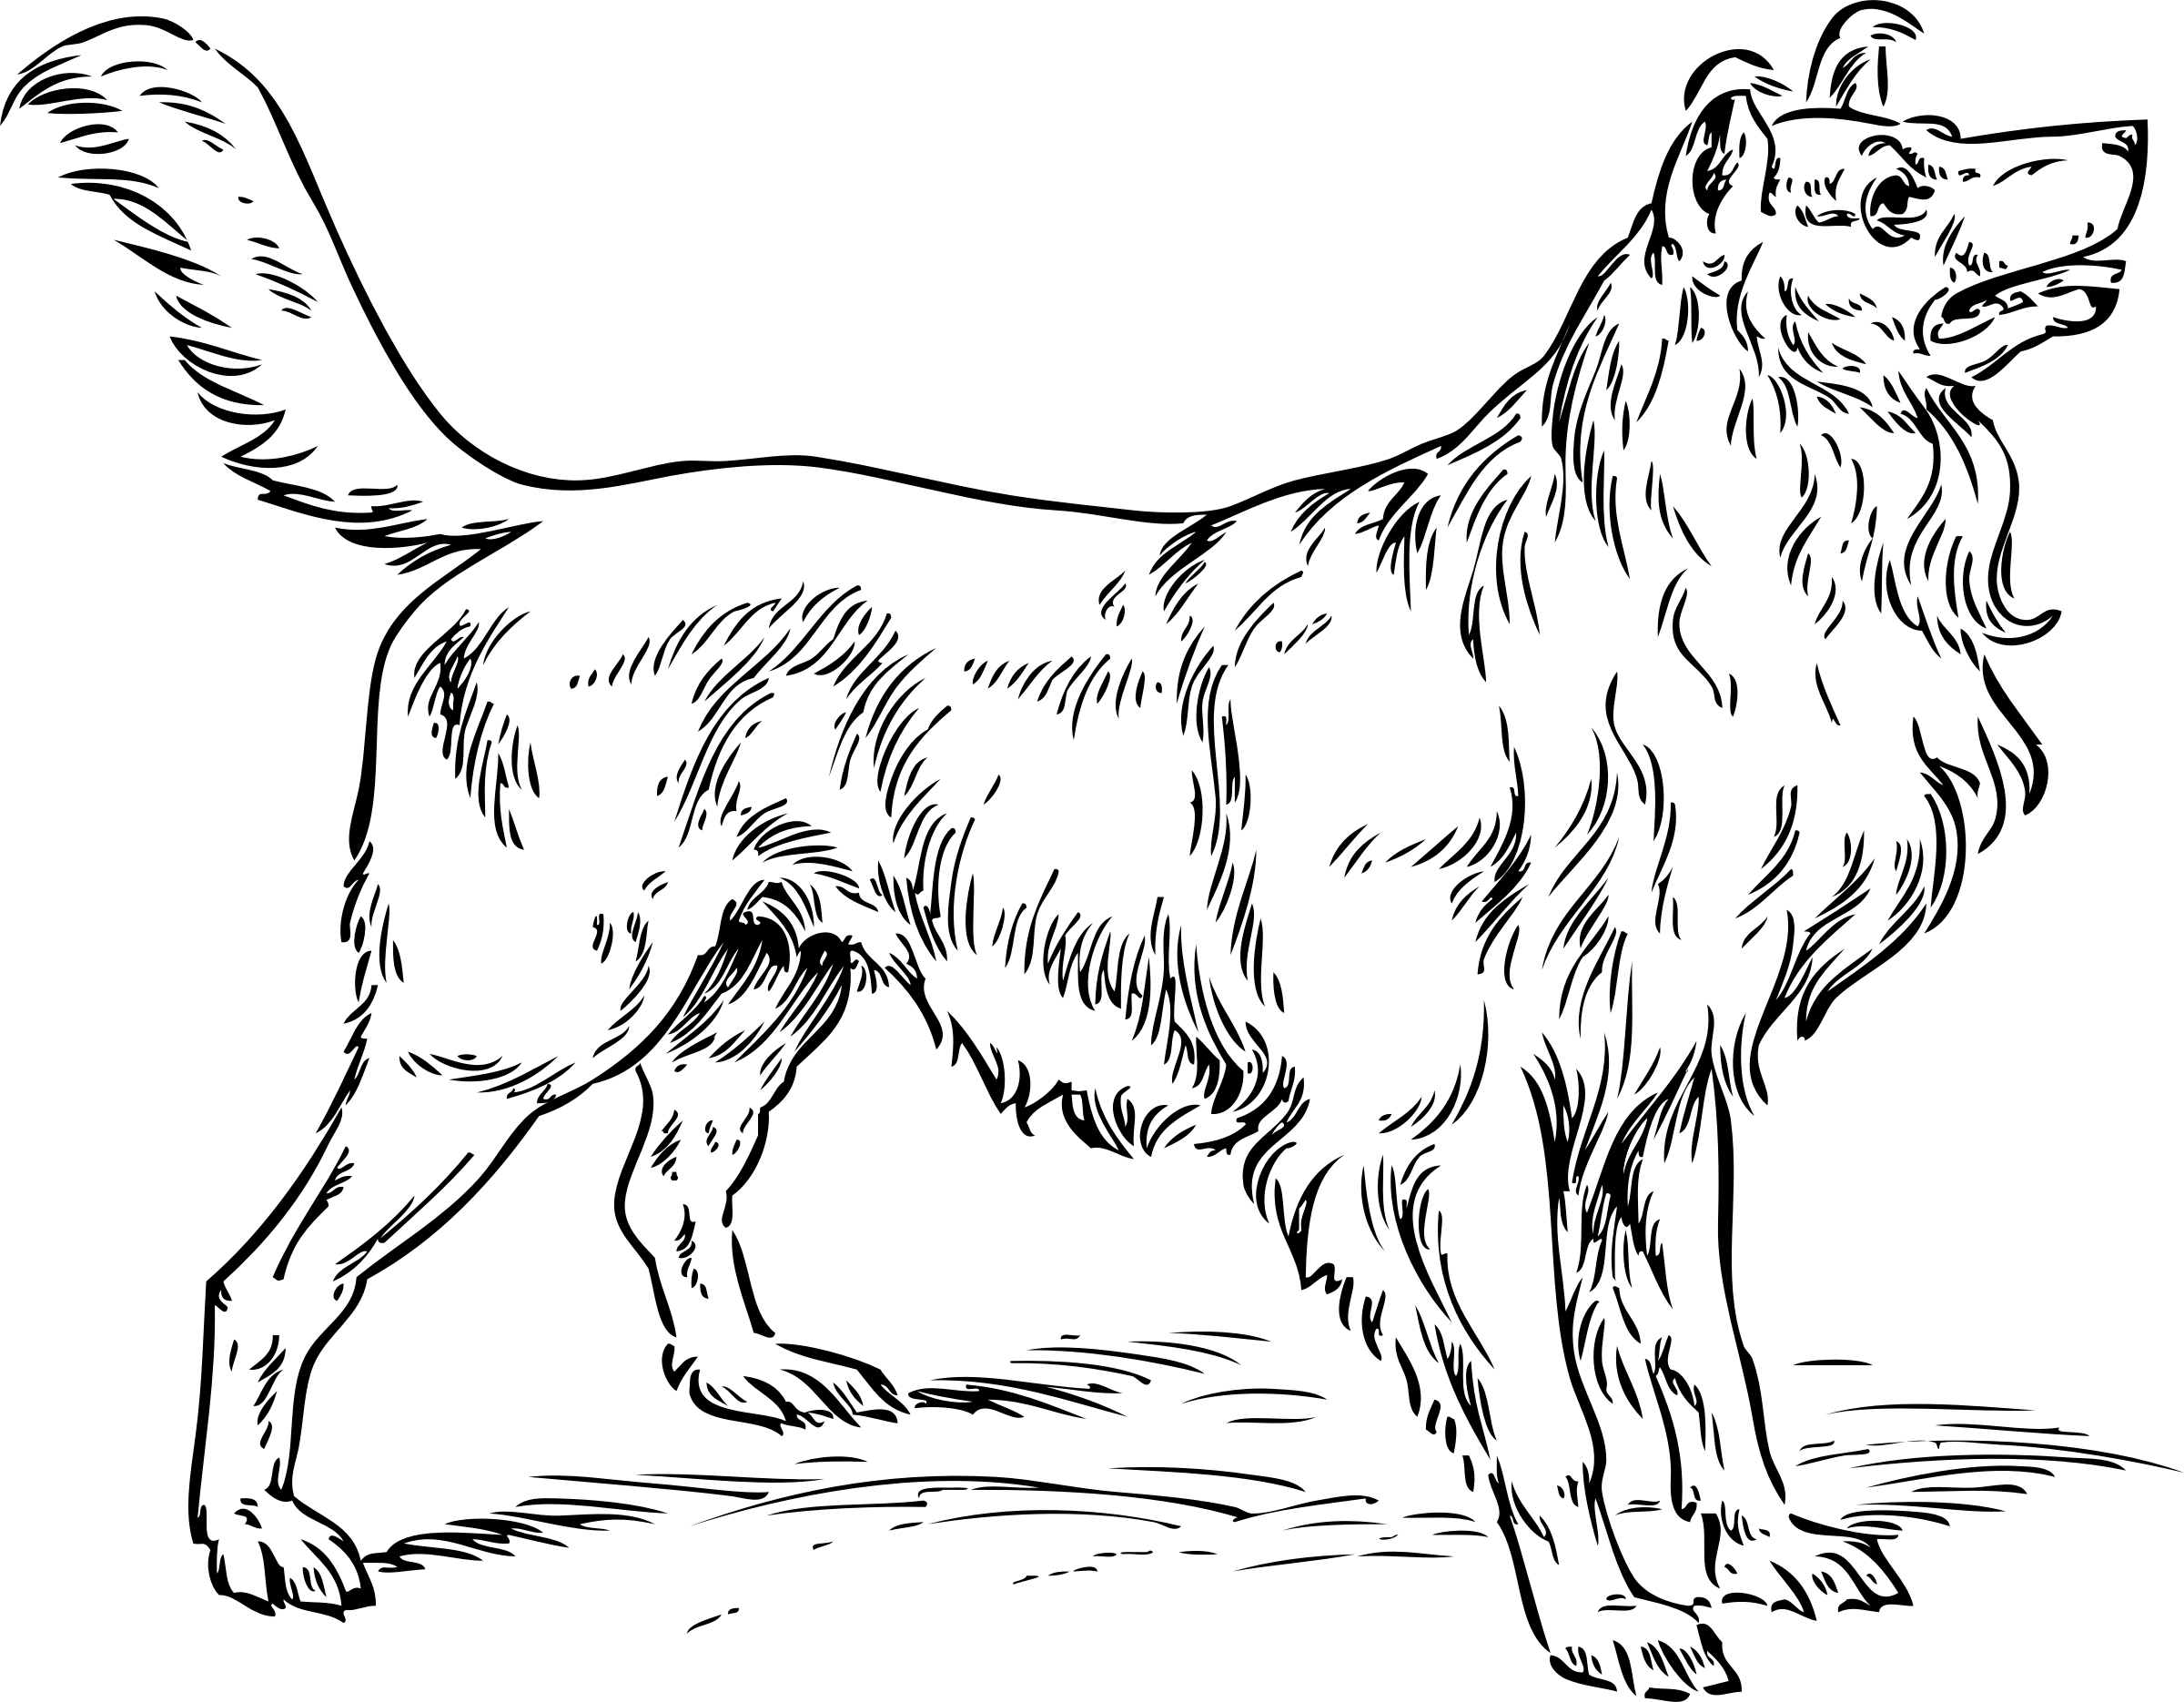 Husky dog clipart black and white svg free download 15 Dog clip art big dog for free download on mbtskoudsalg svg free download